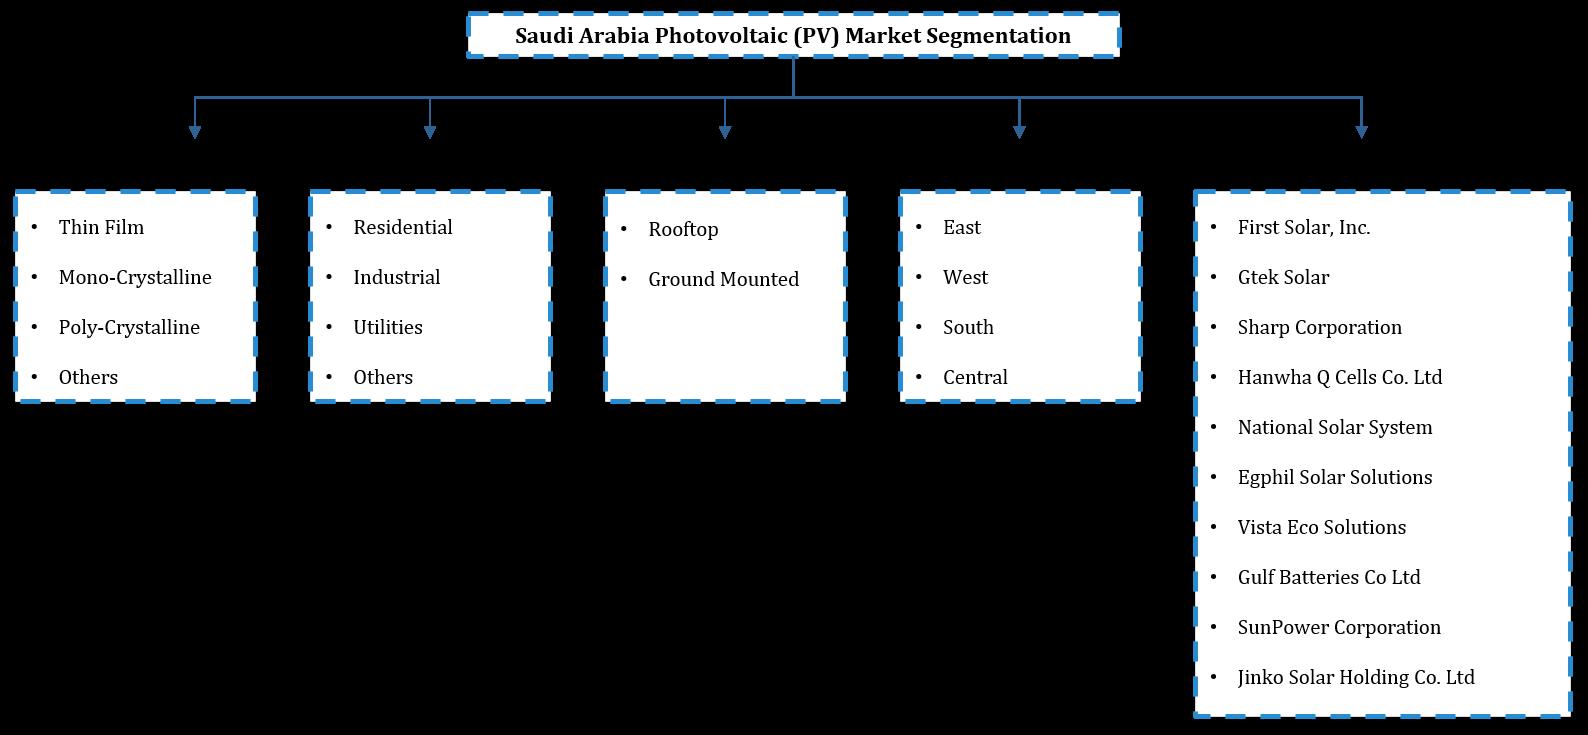 Saudi Arabia Solar Photovolatic (PV) Market Segmentation